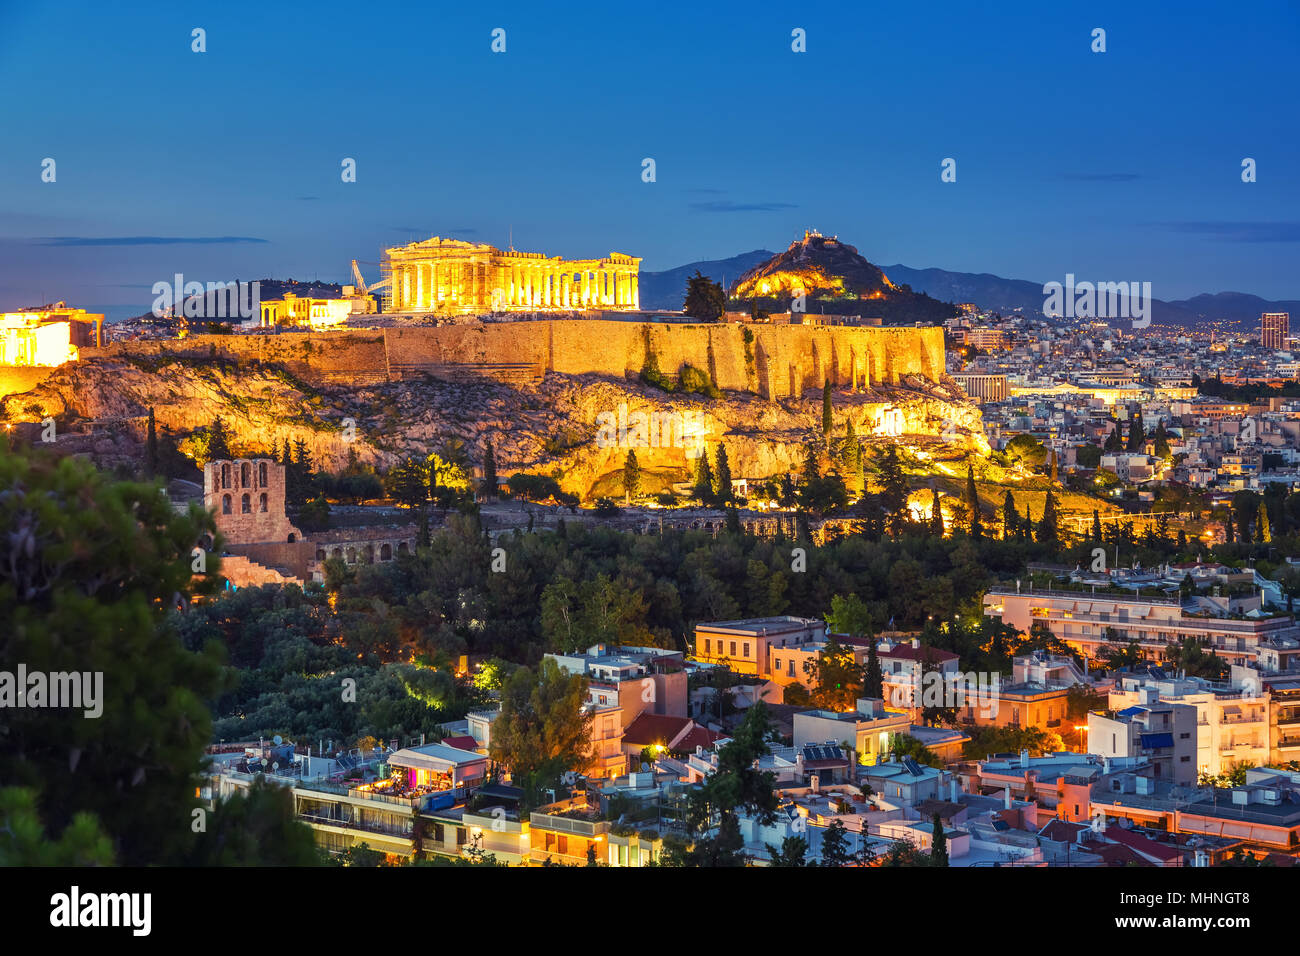 Parthenon, Acropolis of Athens, Greece at sunset - Stock Image